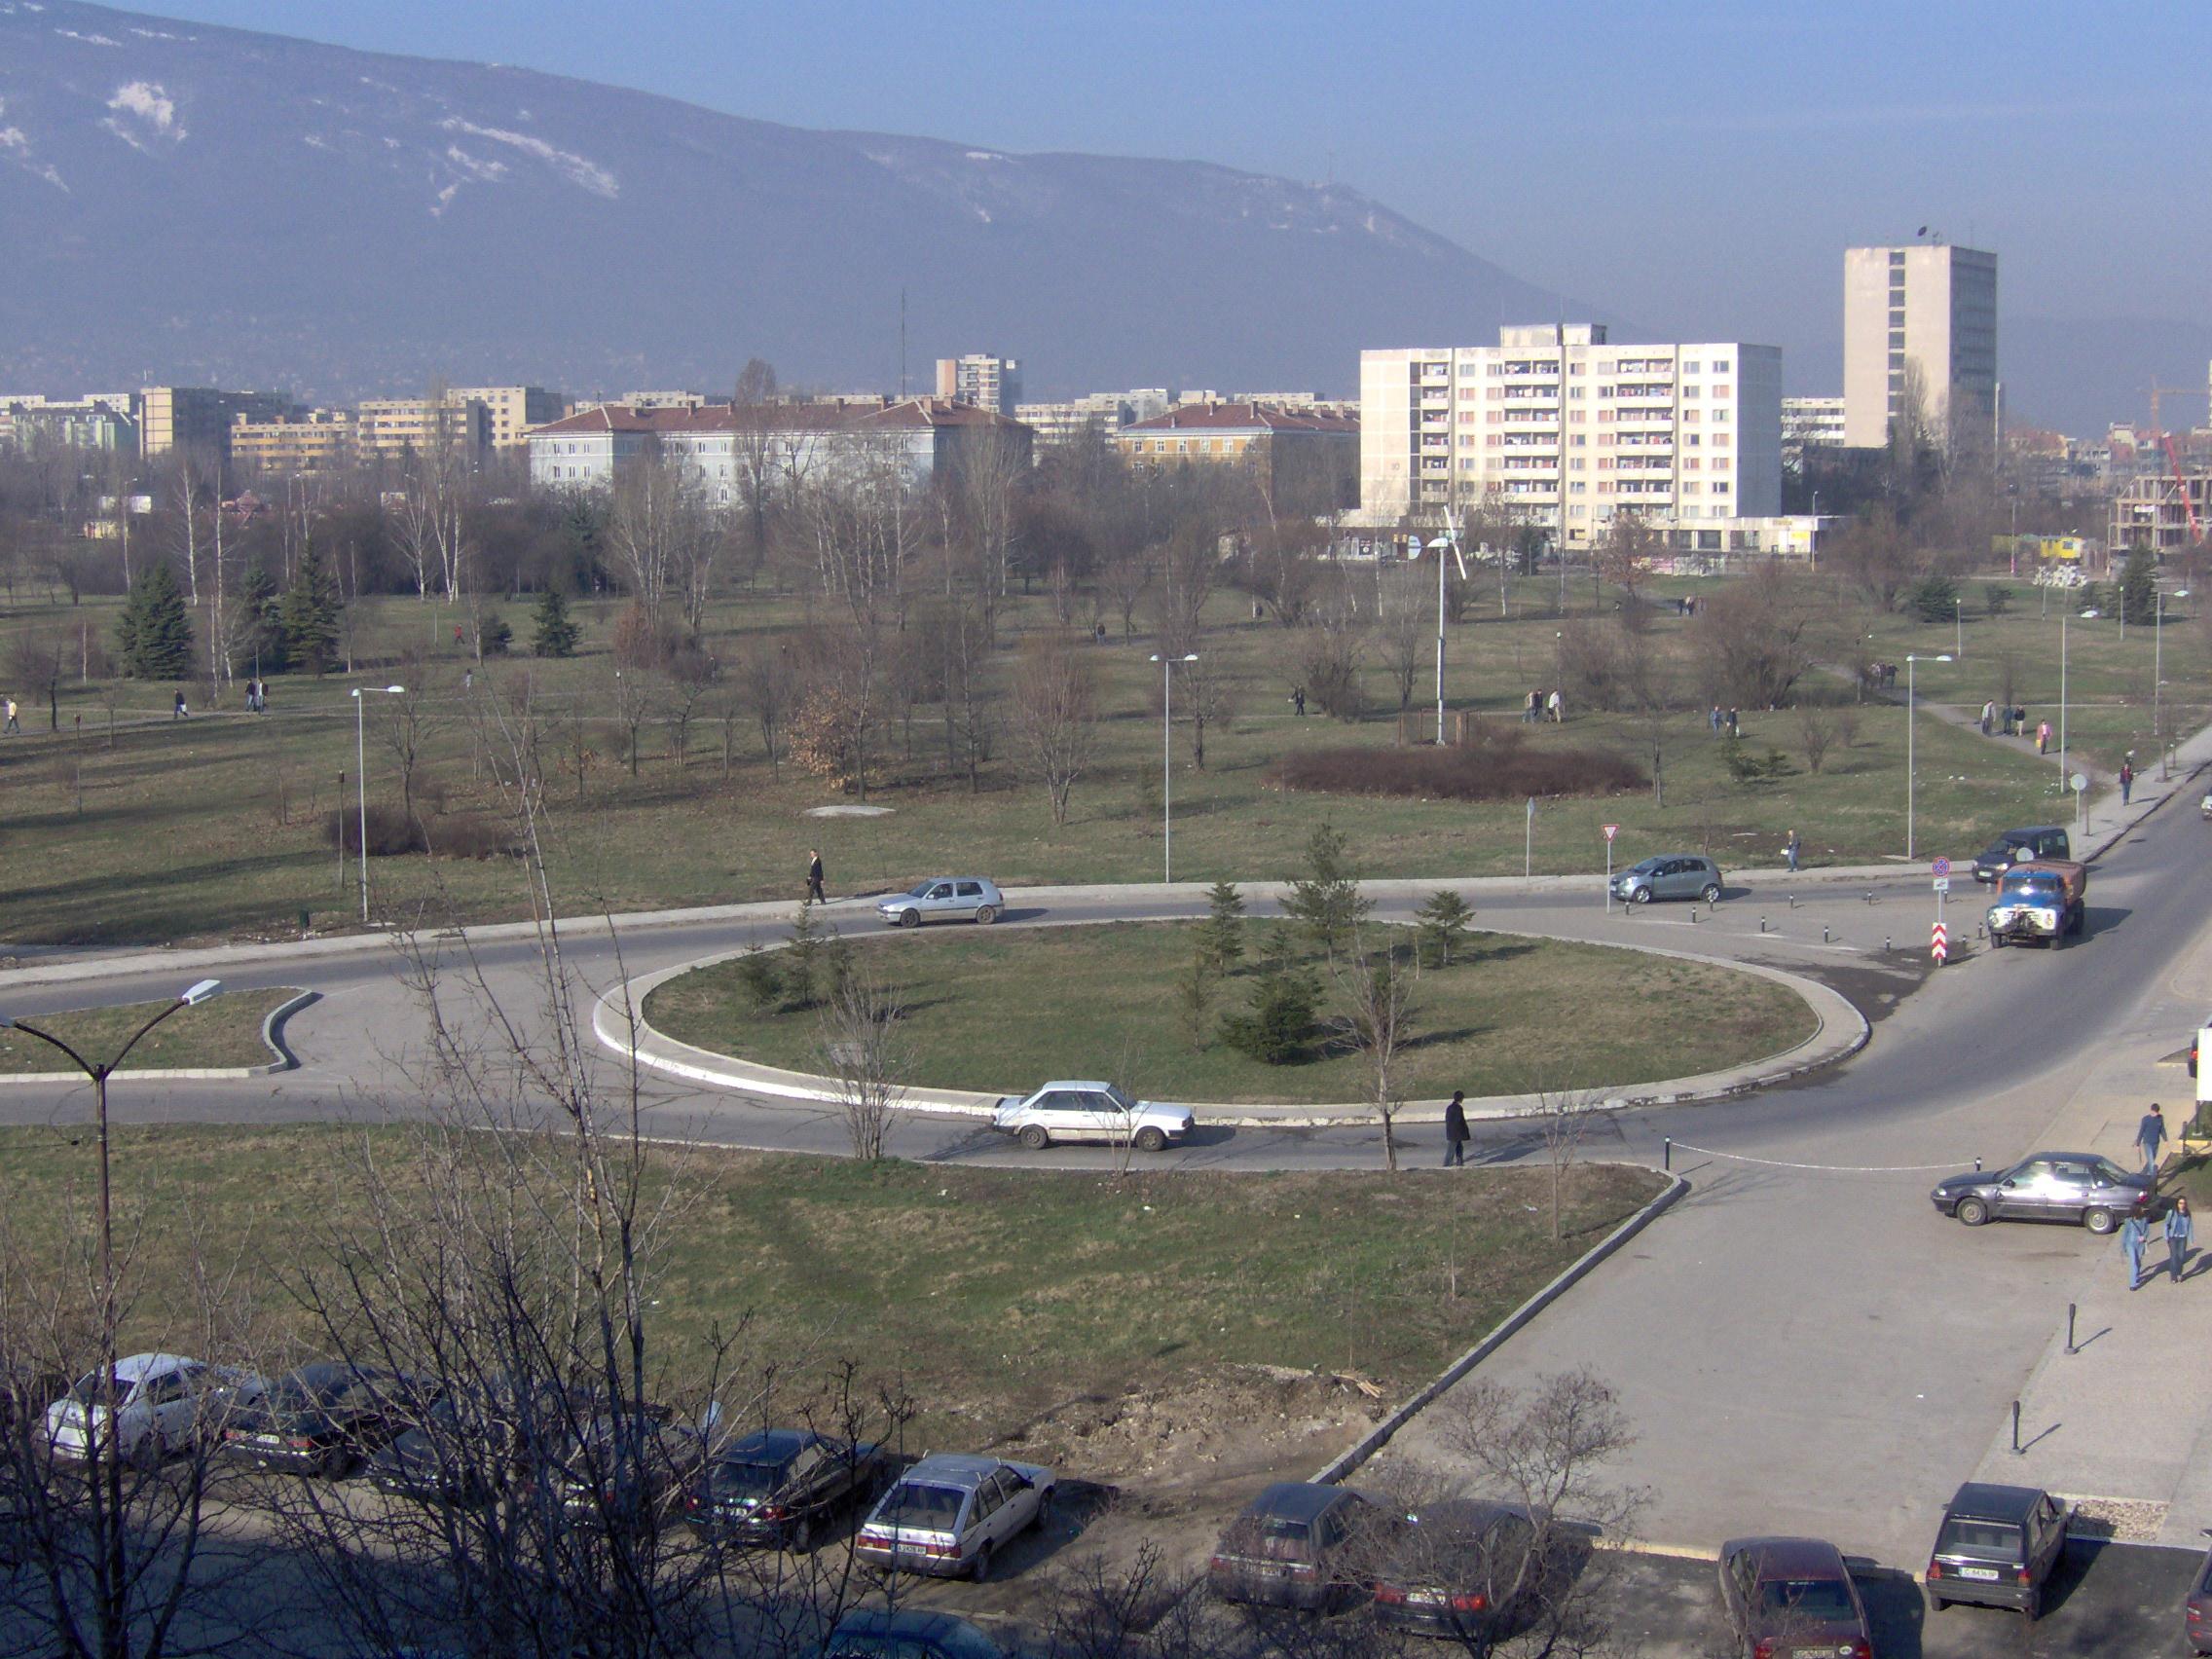 Nature in Bulgaria, Bspo06, Building, Bulgaria, Cars, HQ Photo